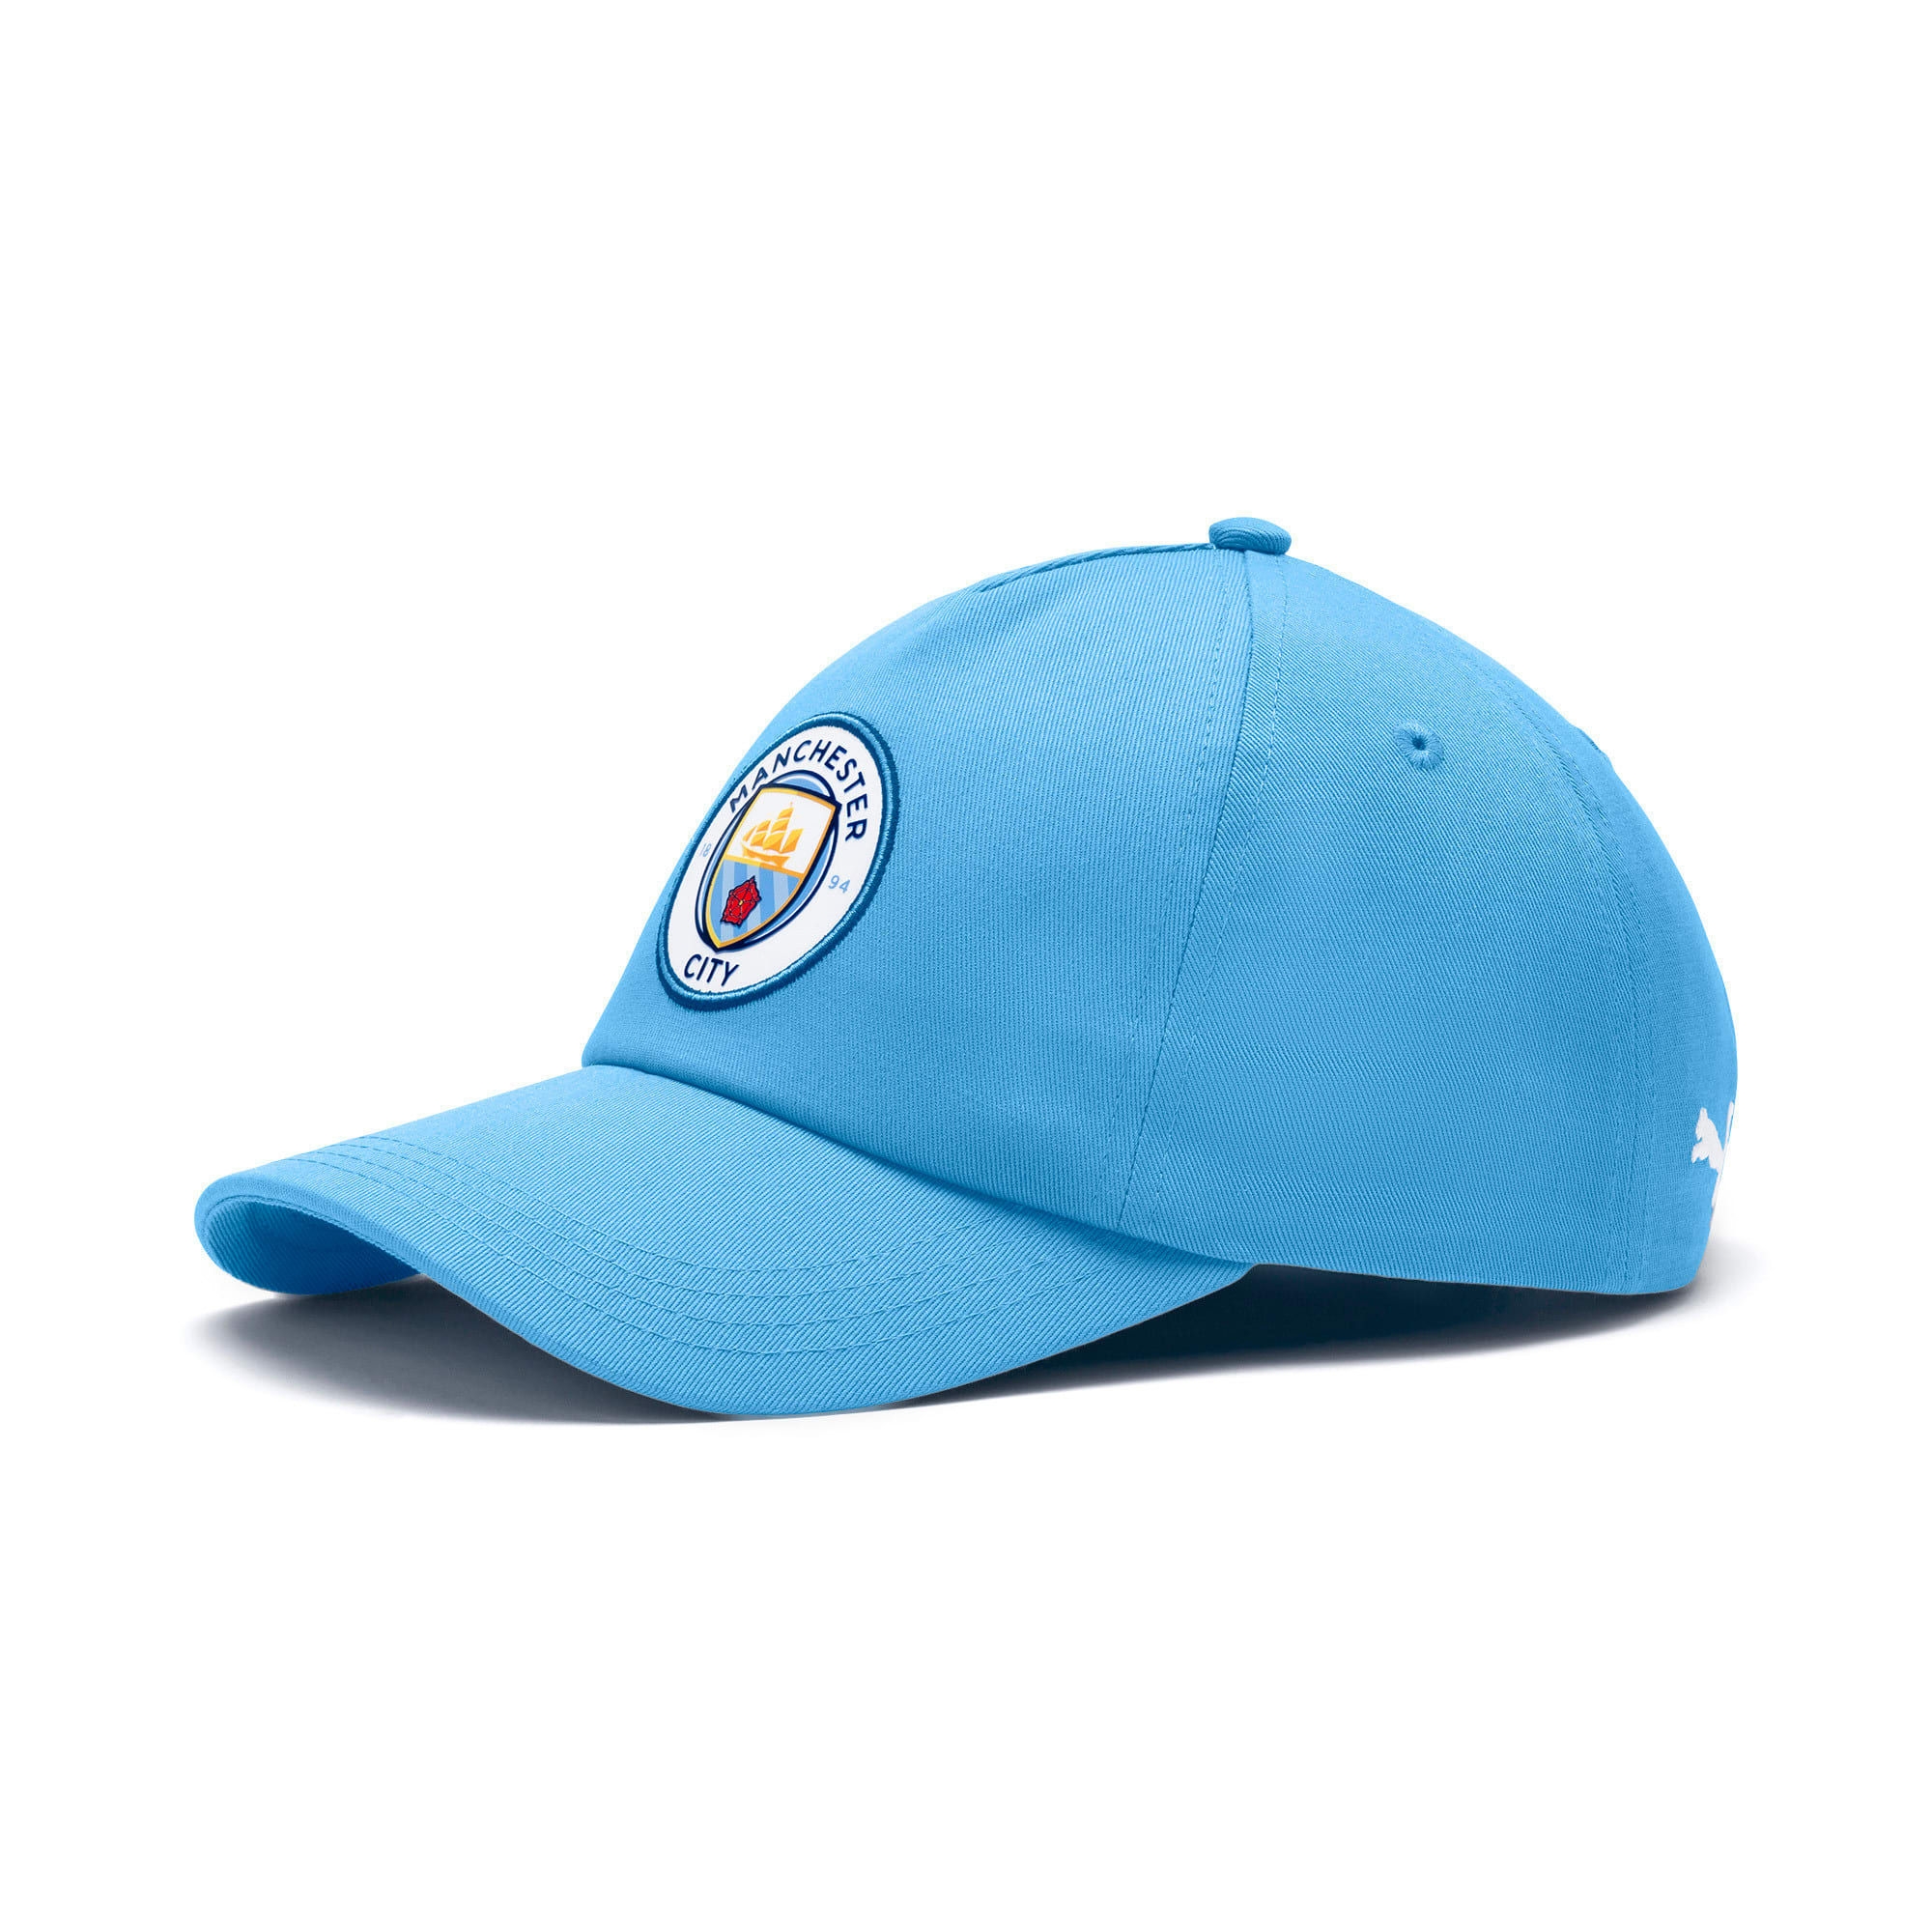 Thumbnail 1 of Casquette Manchester City FC Team, Team Light Blue-Puma White, medium